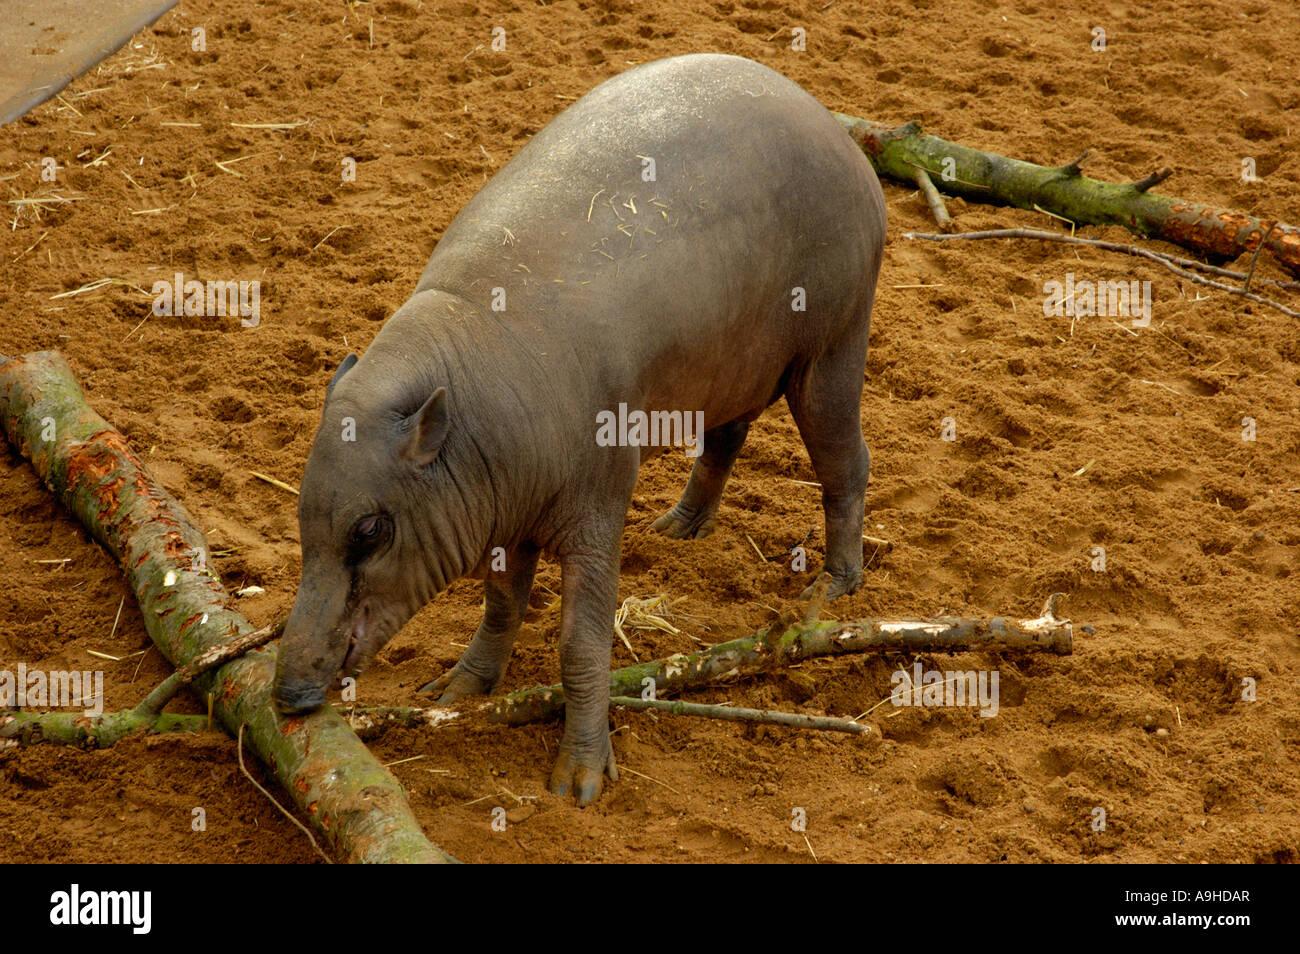 Babirusa sulawesi - Stock Image